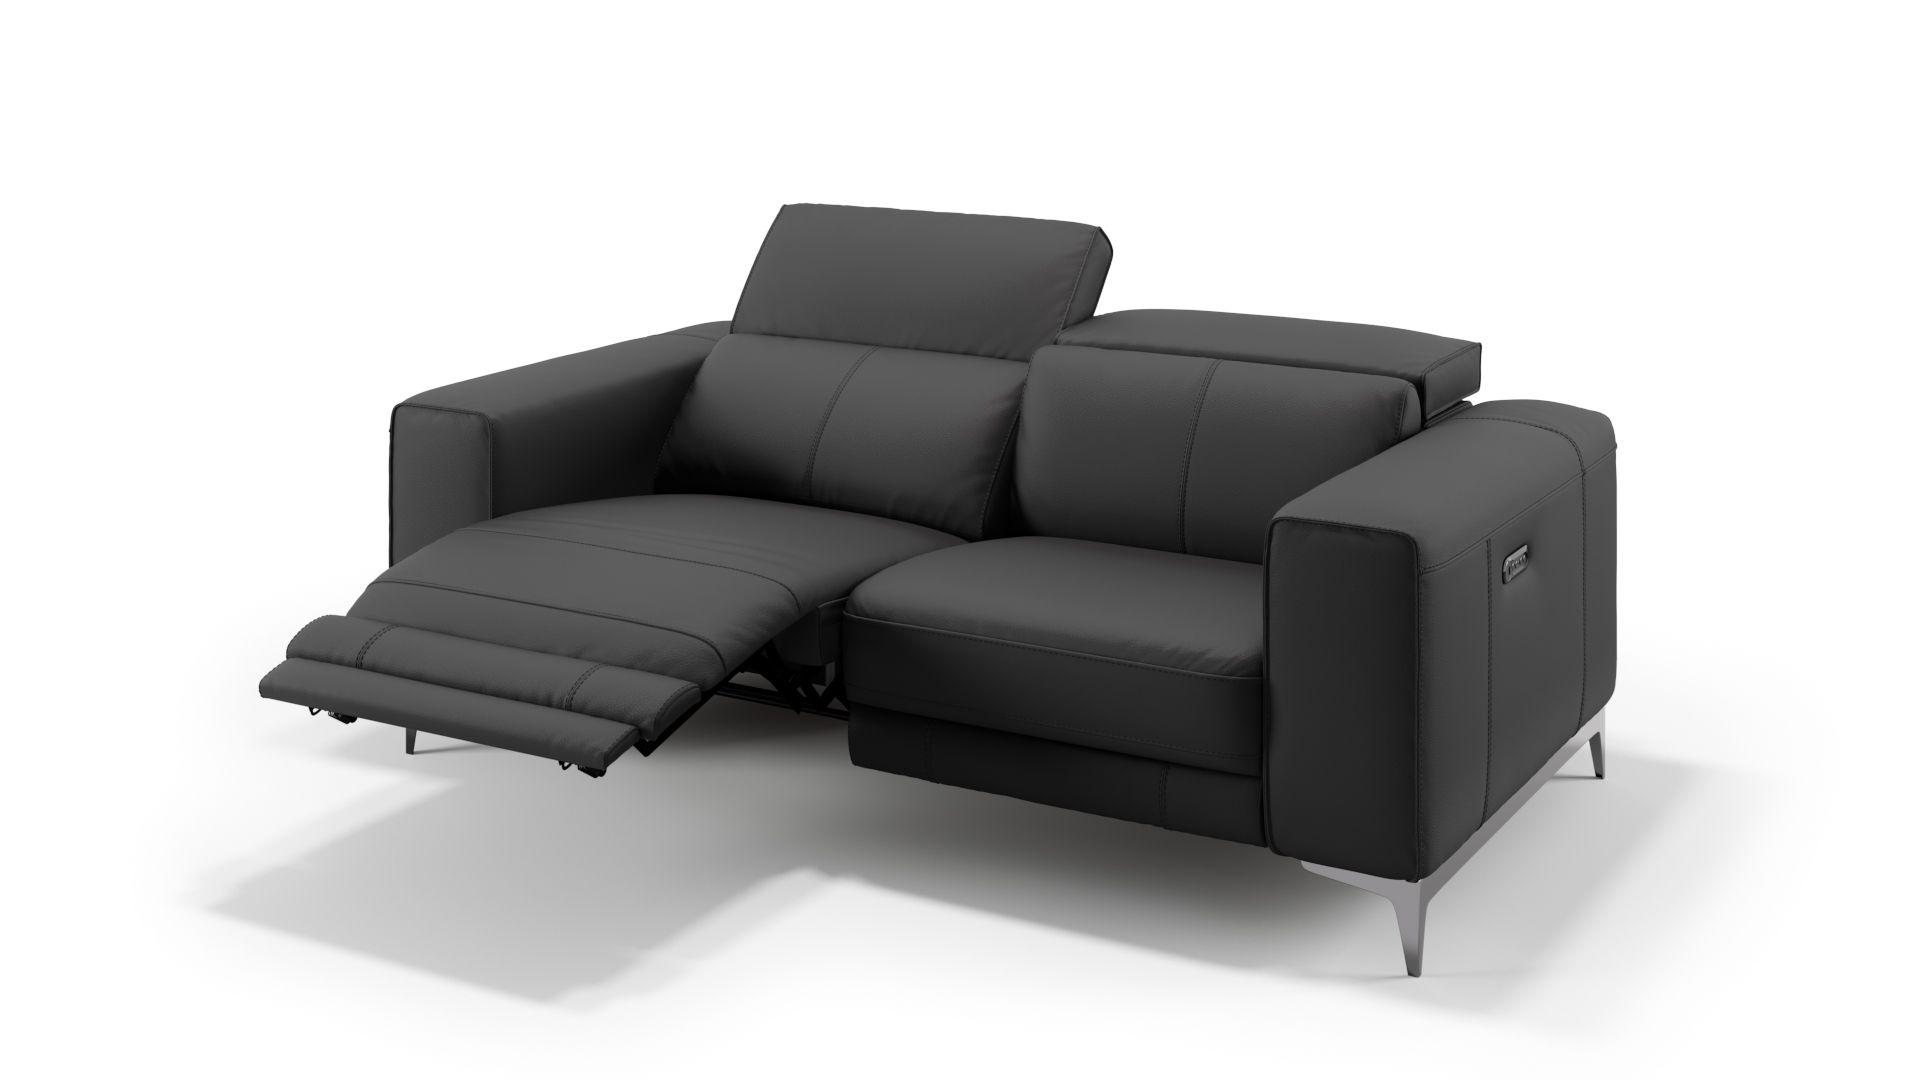 Leder 2-Sitzer Sofa CUPELLO